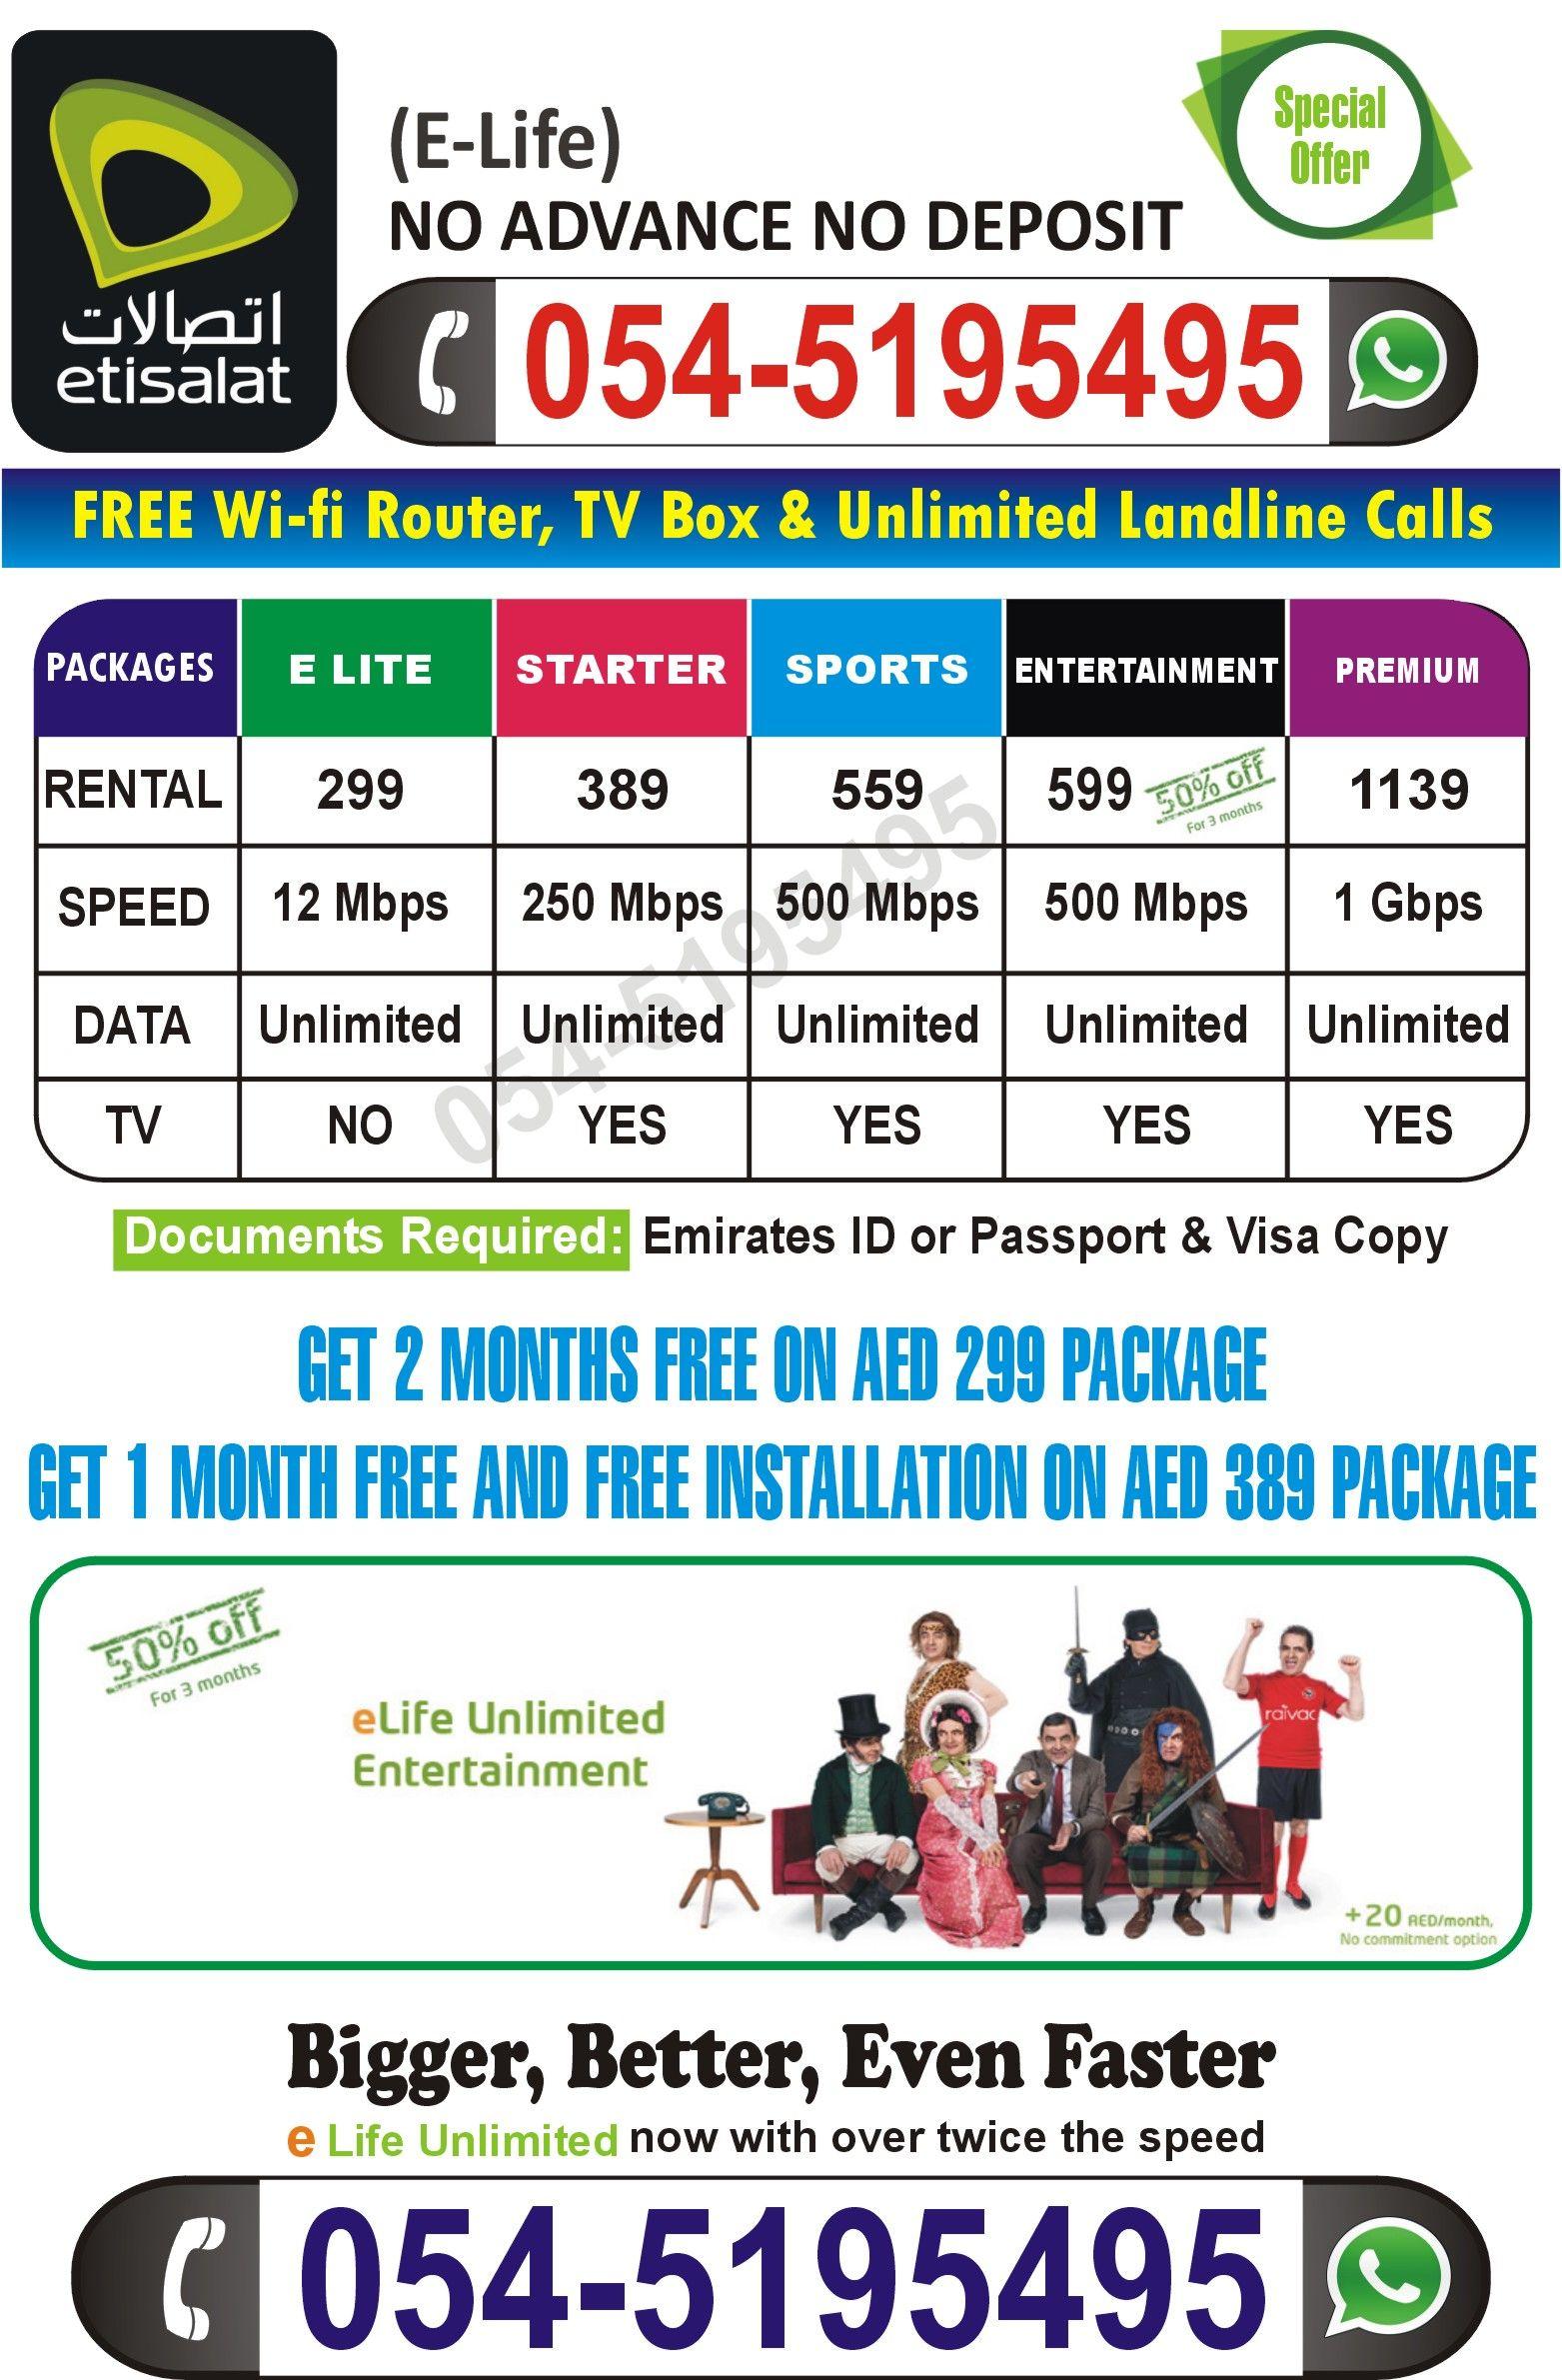 Etisalat Elife Home Internet Internet Plans Wifi Internet